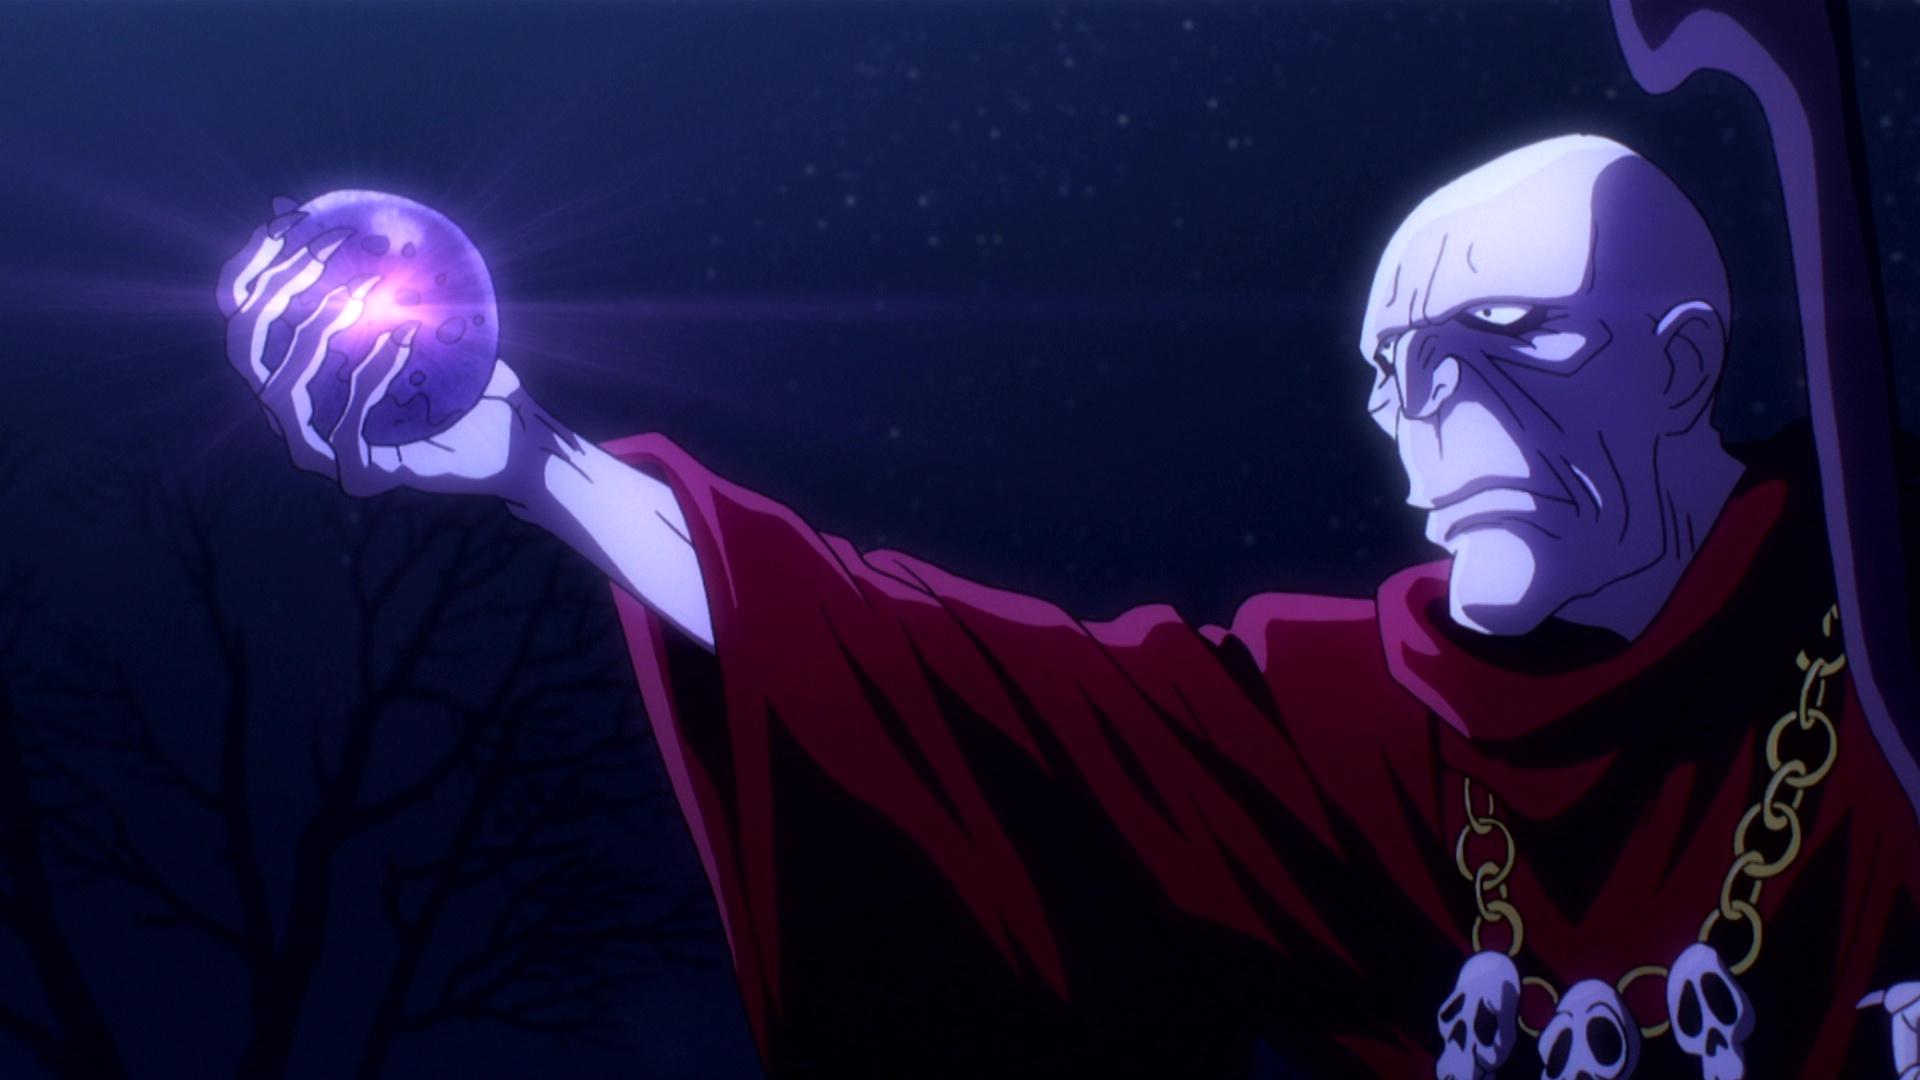 Watch Overlord Season 1 Episode 9 Sub & Dub | Anime Simulcast